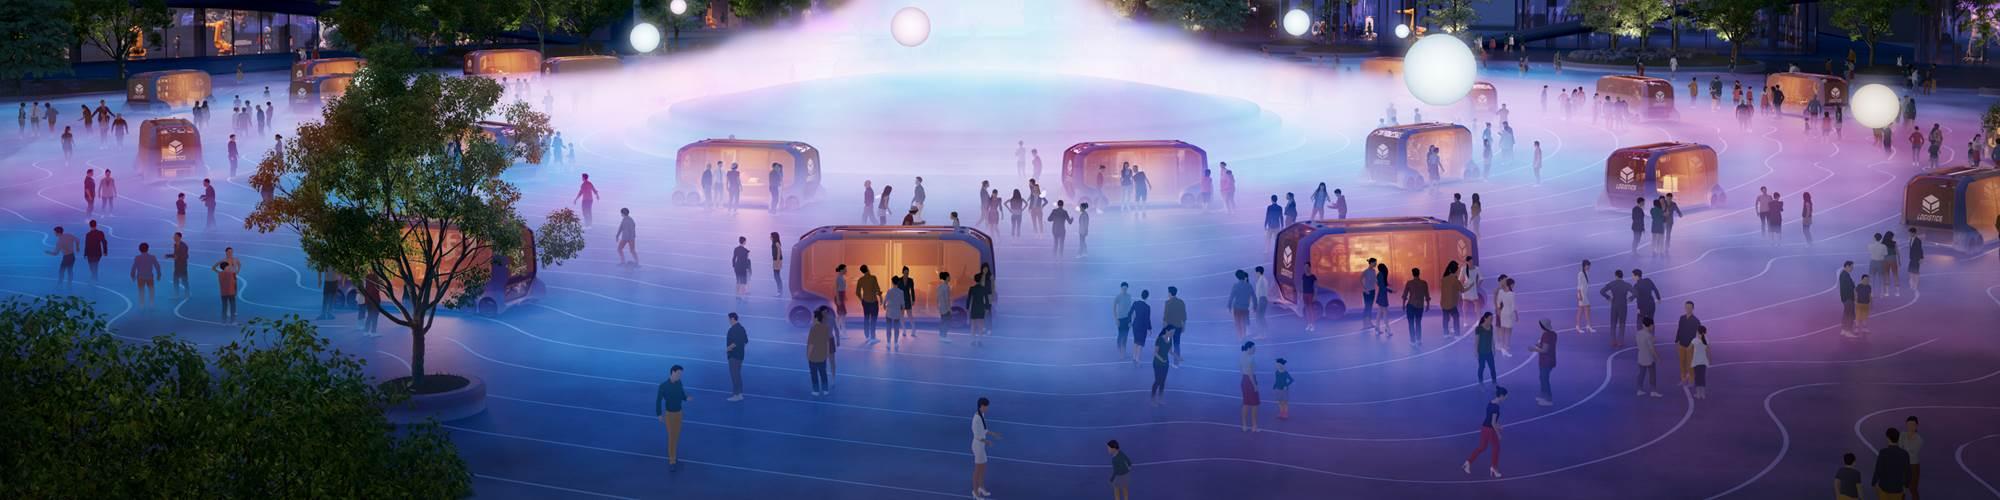 Toyota Woven City concept